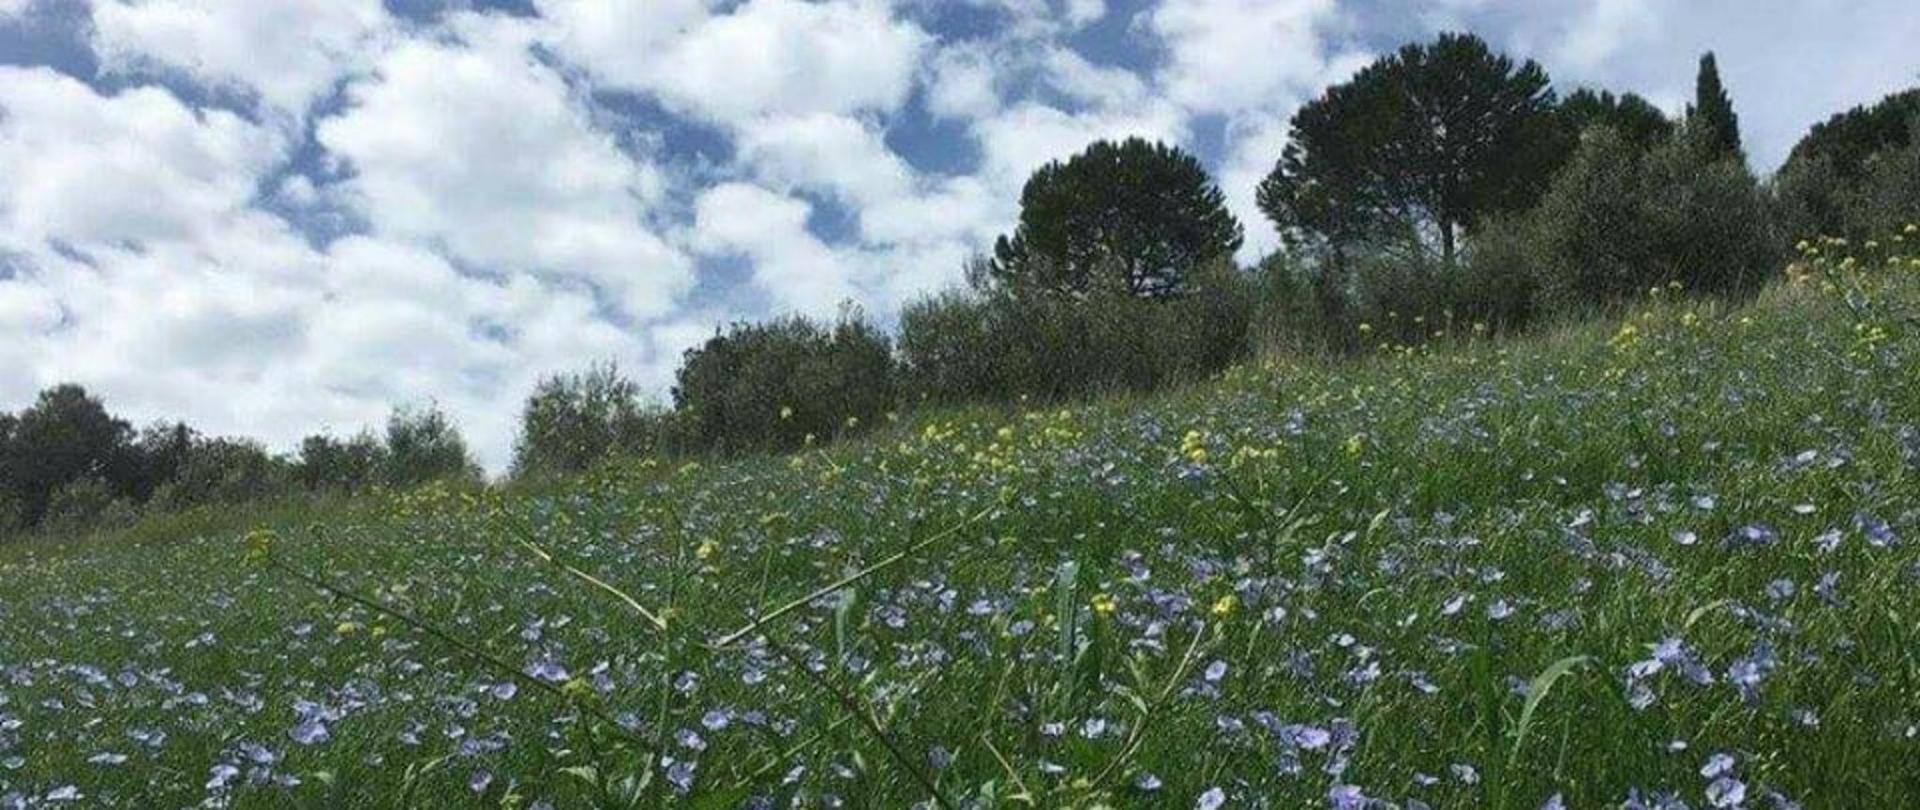 fiori di lino.jpg